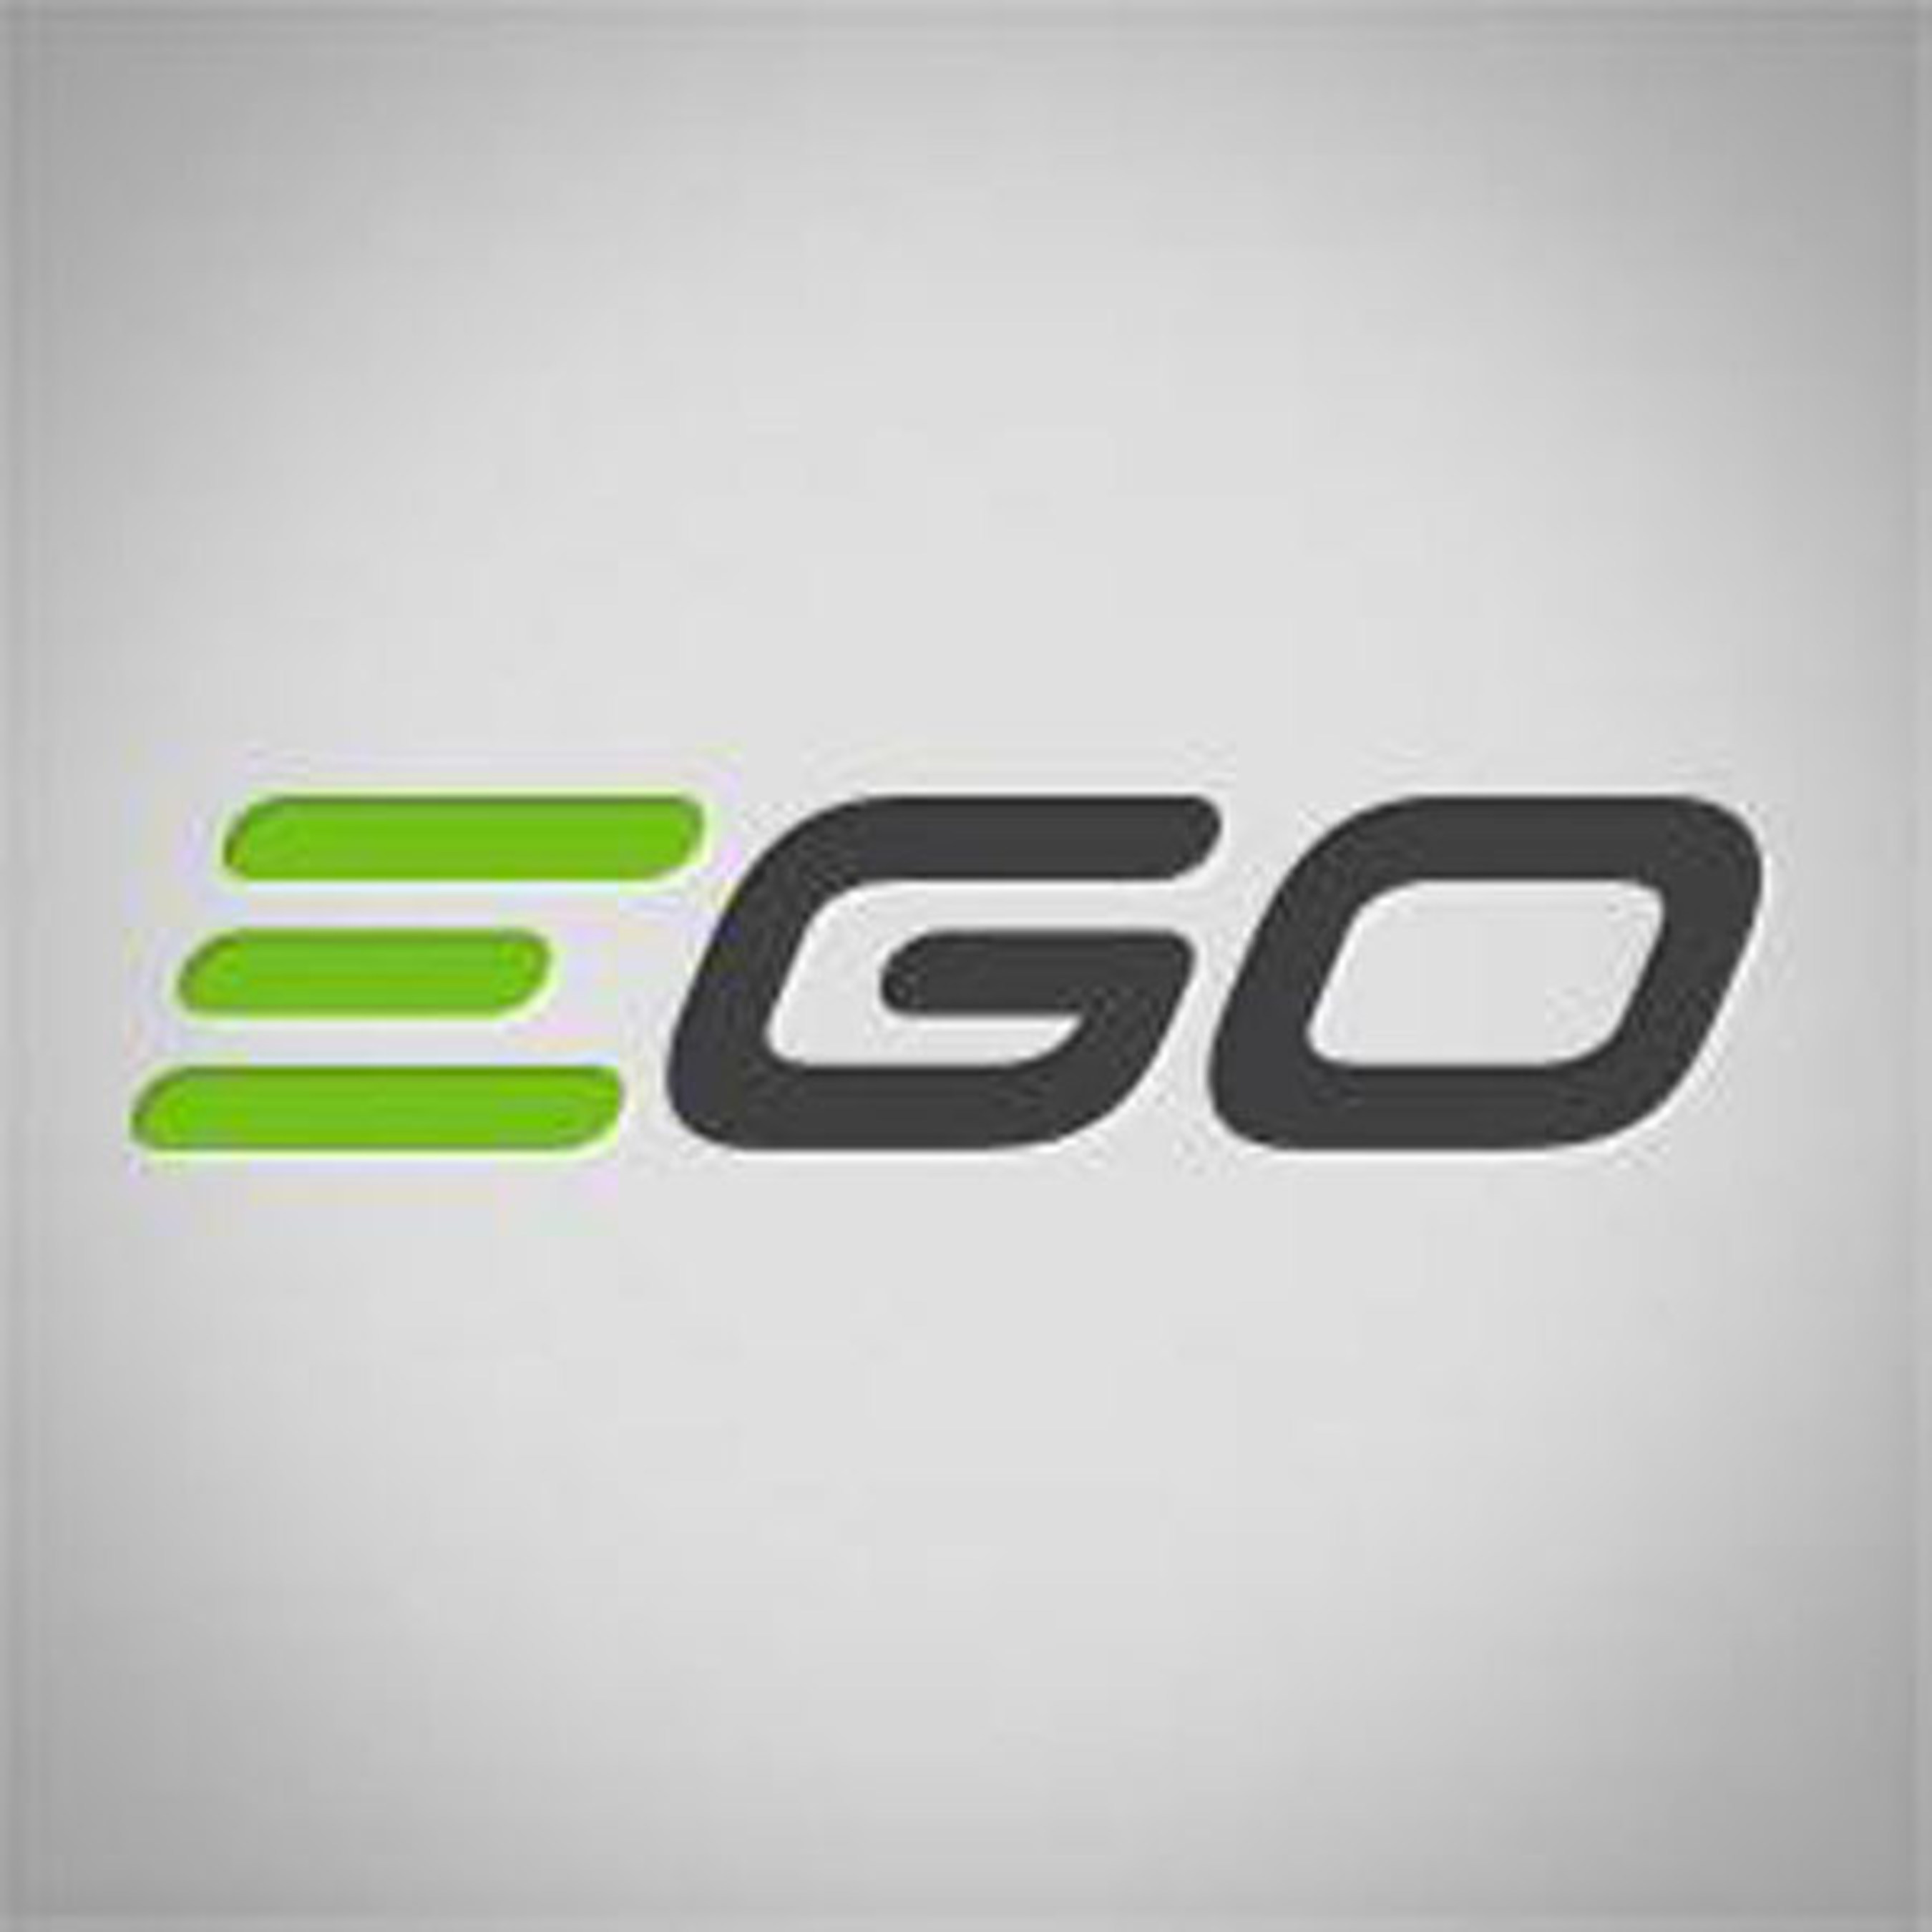 EGO Power Advanced Technology Powered Lawn Equipment